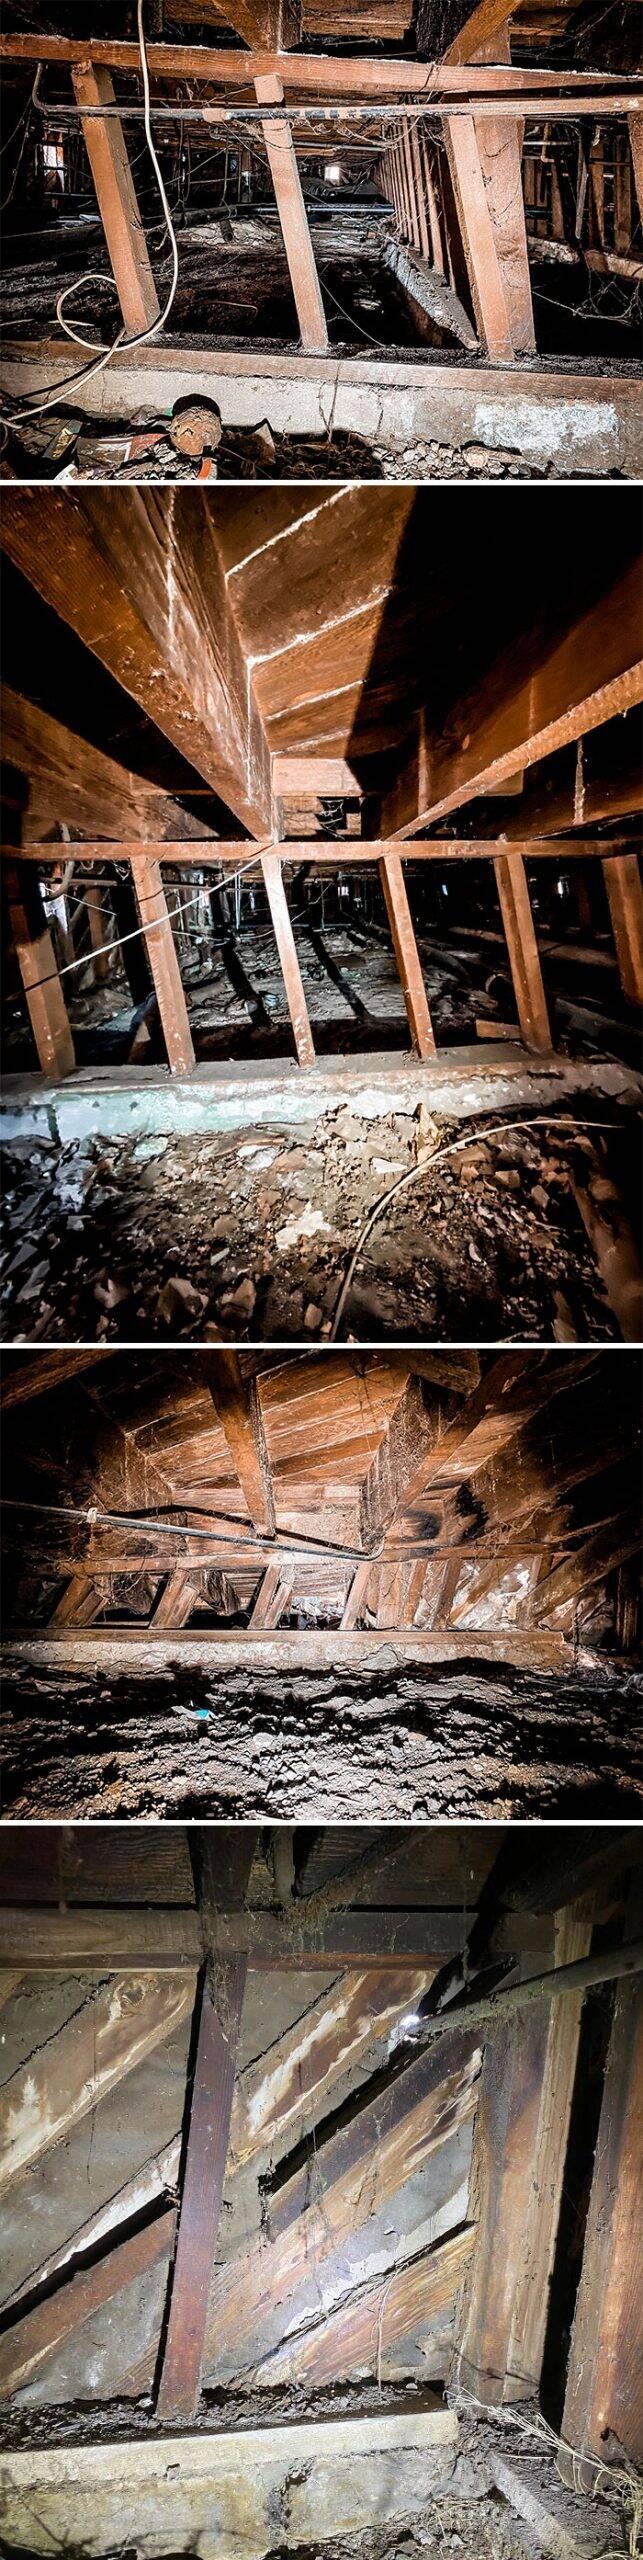 15 erros de estrutura da casa que surpreenderam inspetores